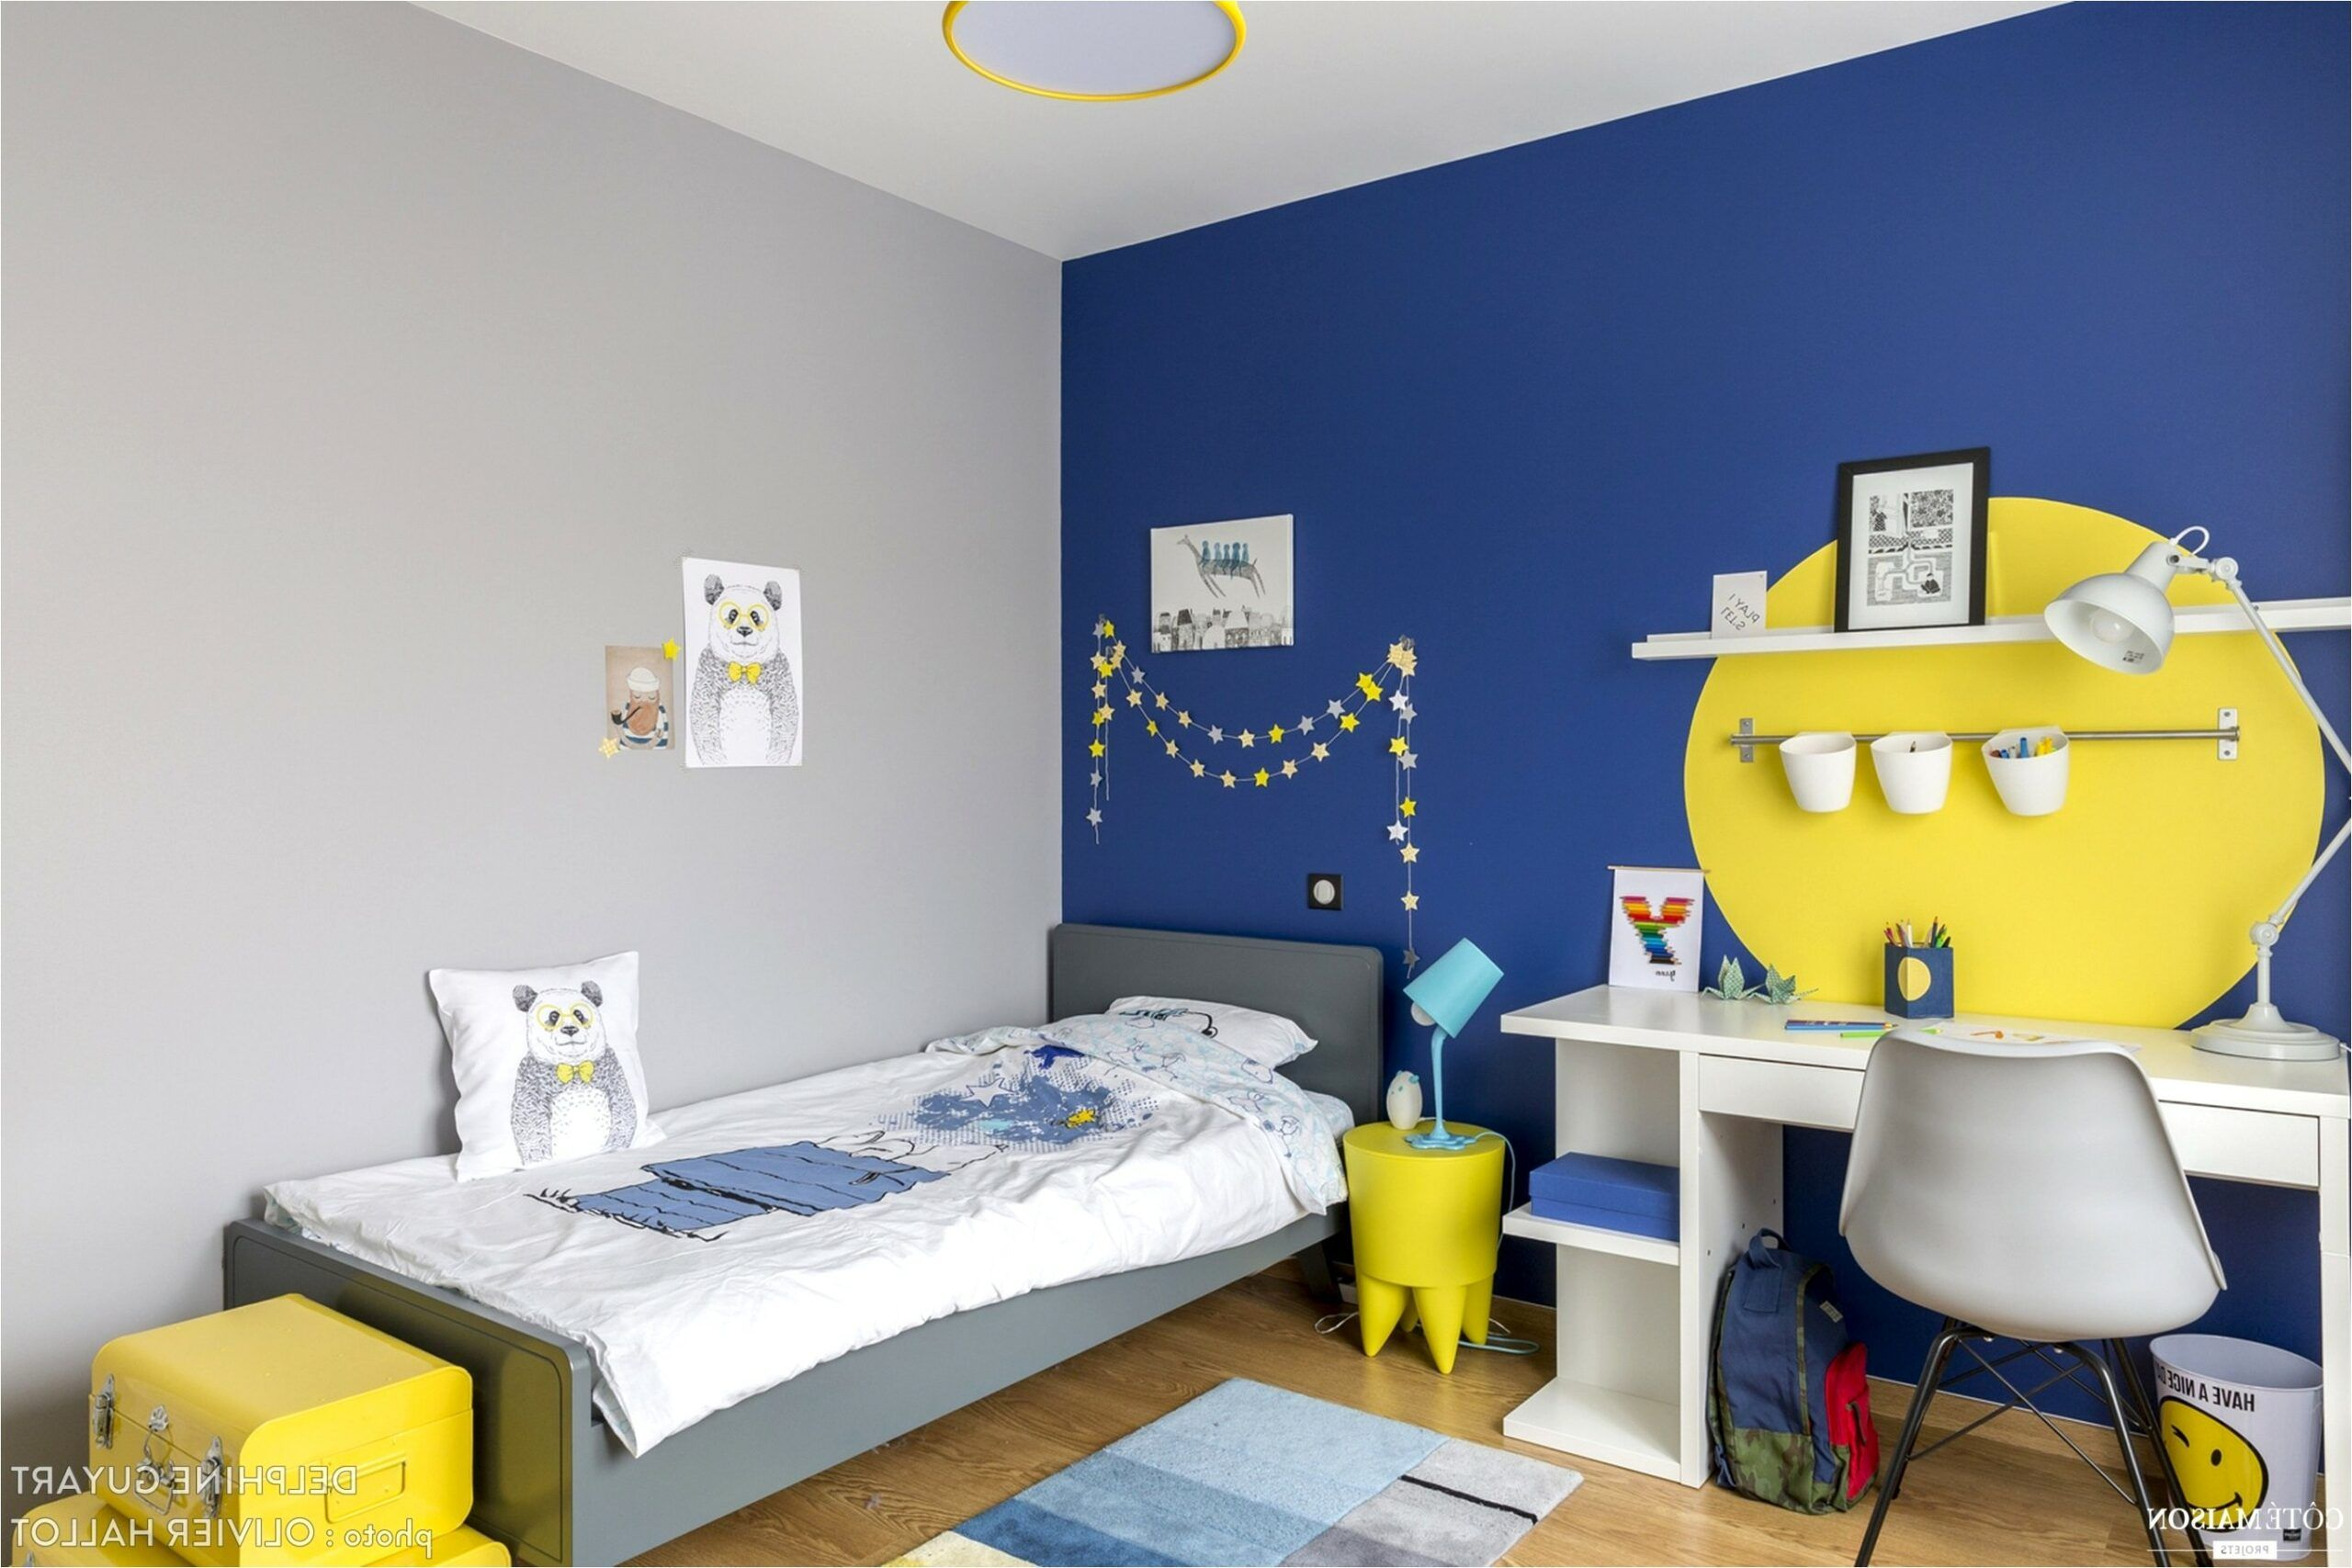 Deco Chambre Enfant Garcon 20 Ans en 20  Idee deco chambre